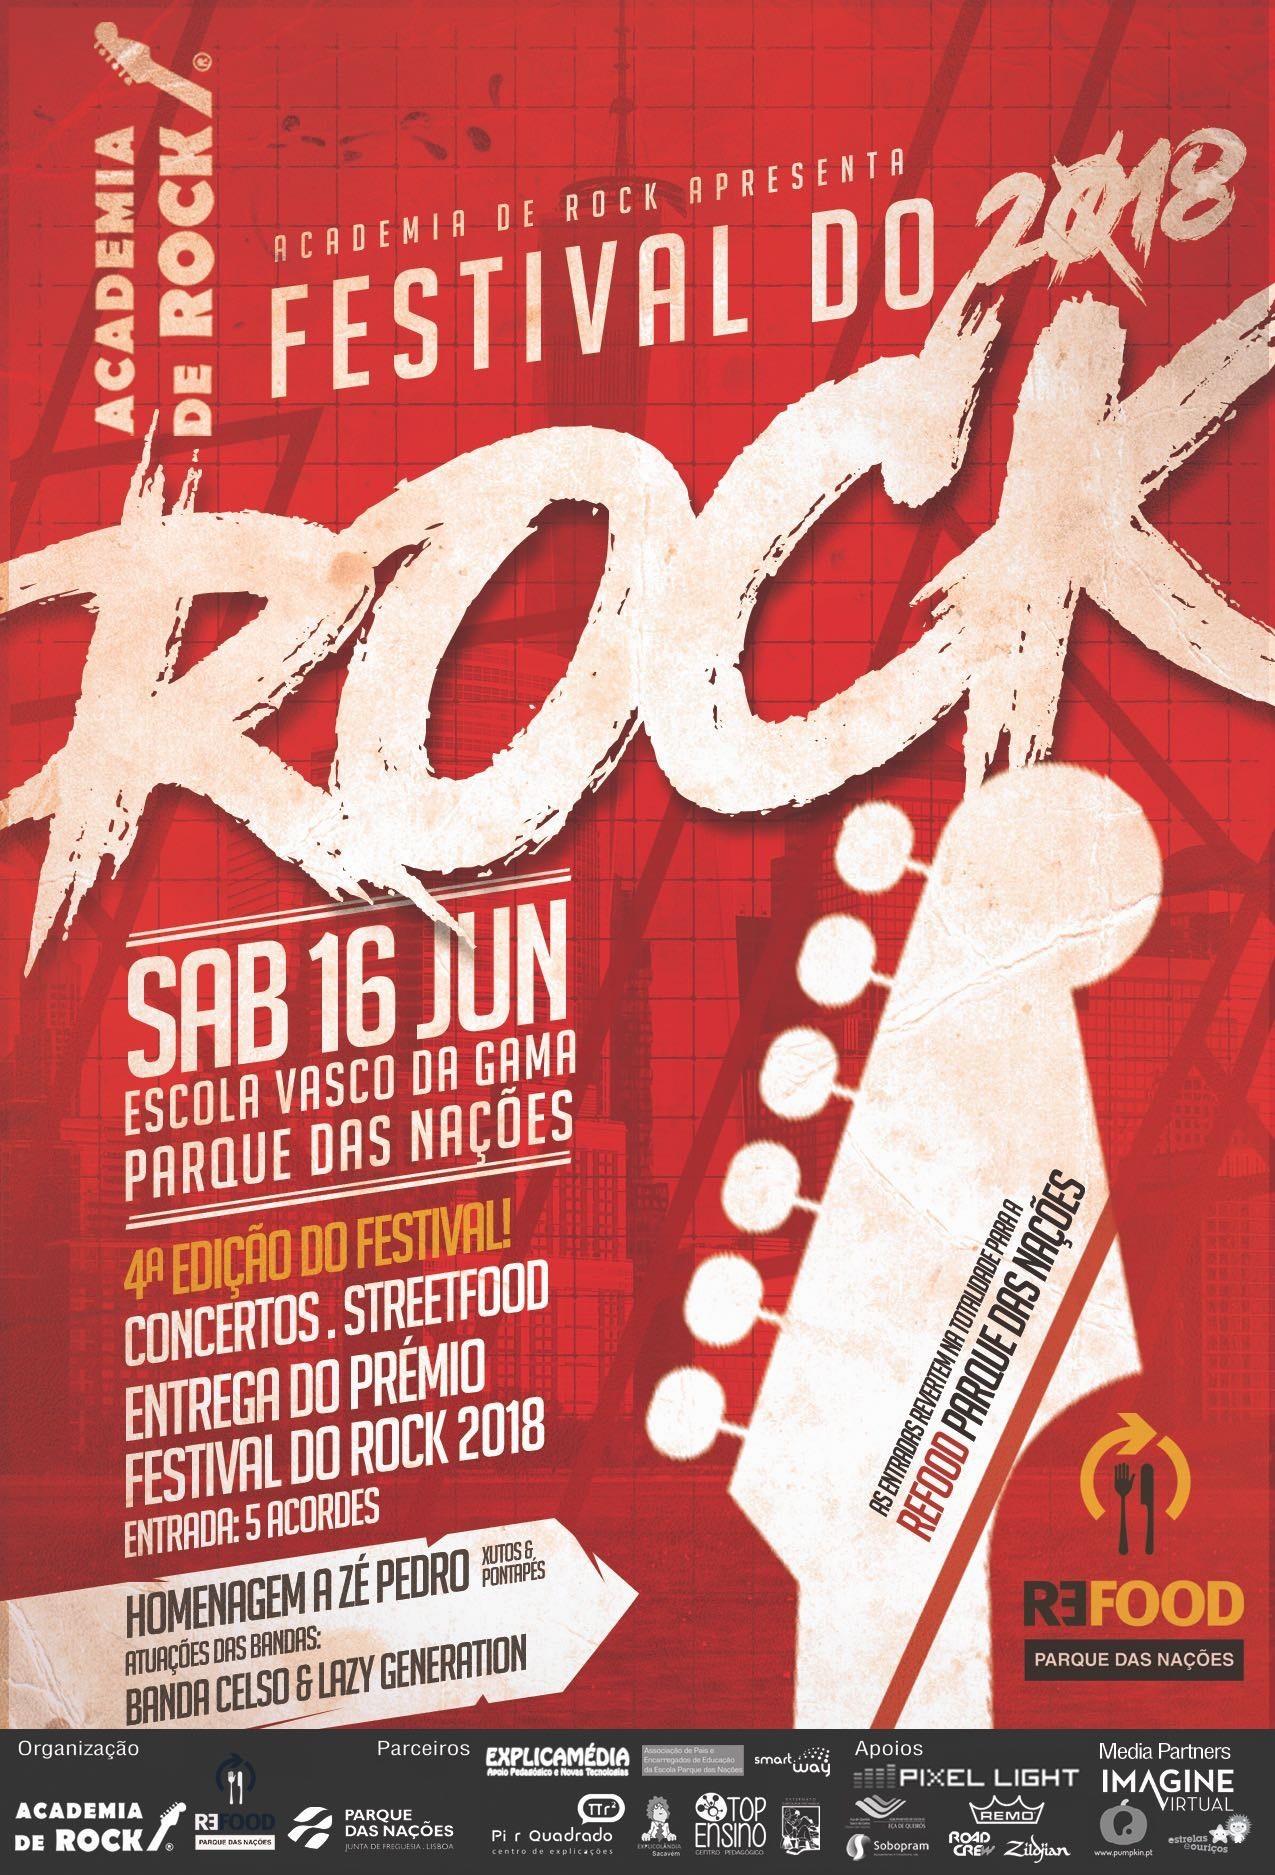 FESTIVAL DO ROCK 2018